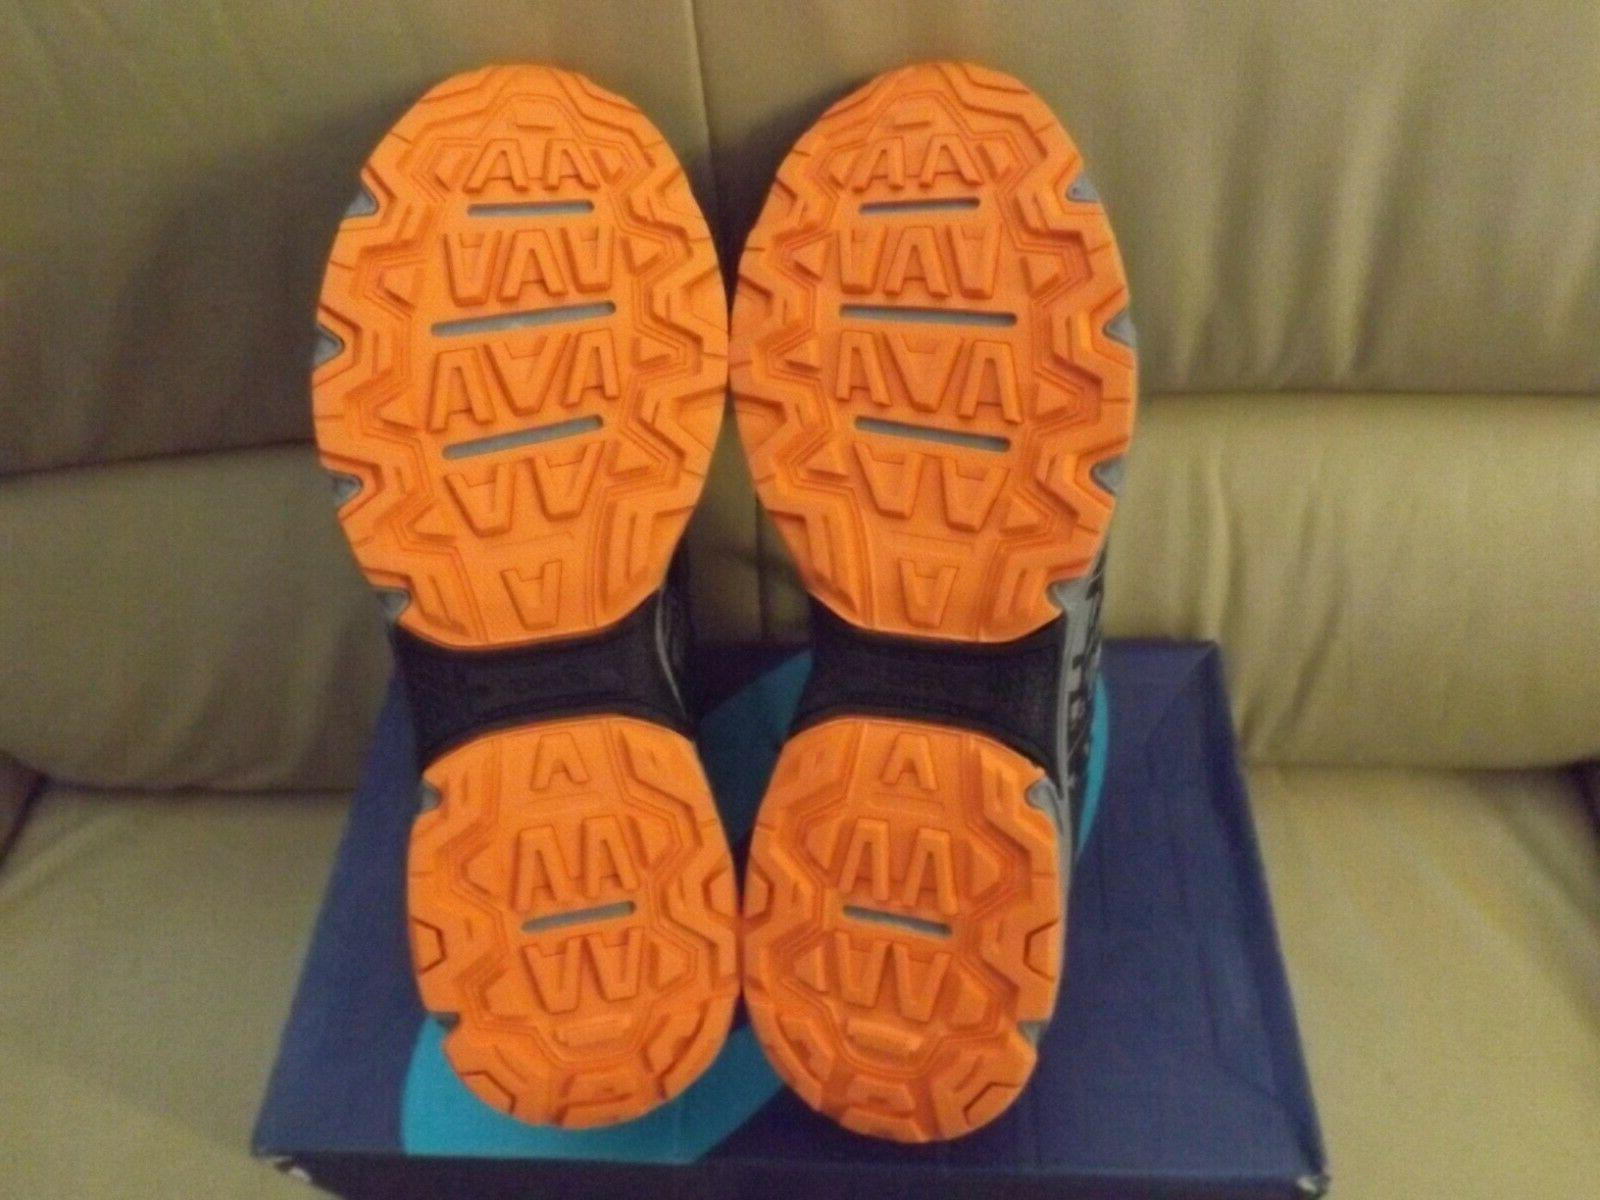 ASICS GEL-Venture Size Running Shoes T6G1Q-9616 NEW